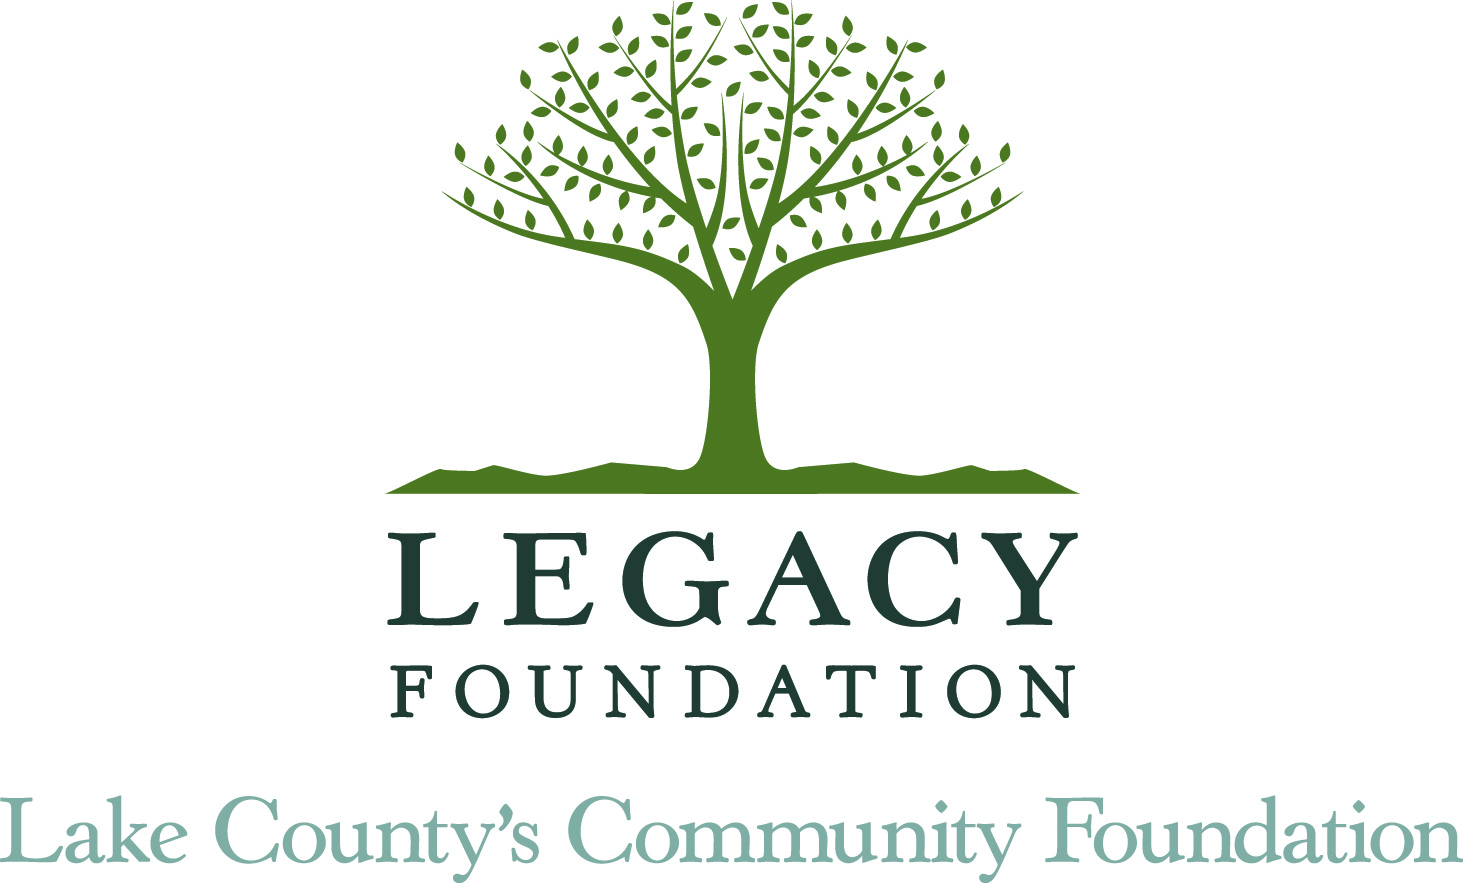 Legacy Foundation tree with tagline underneath